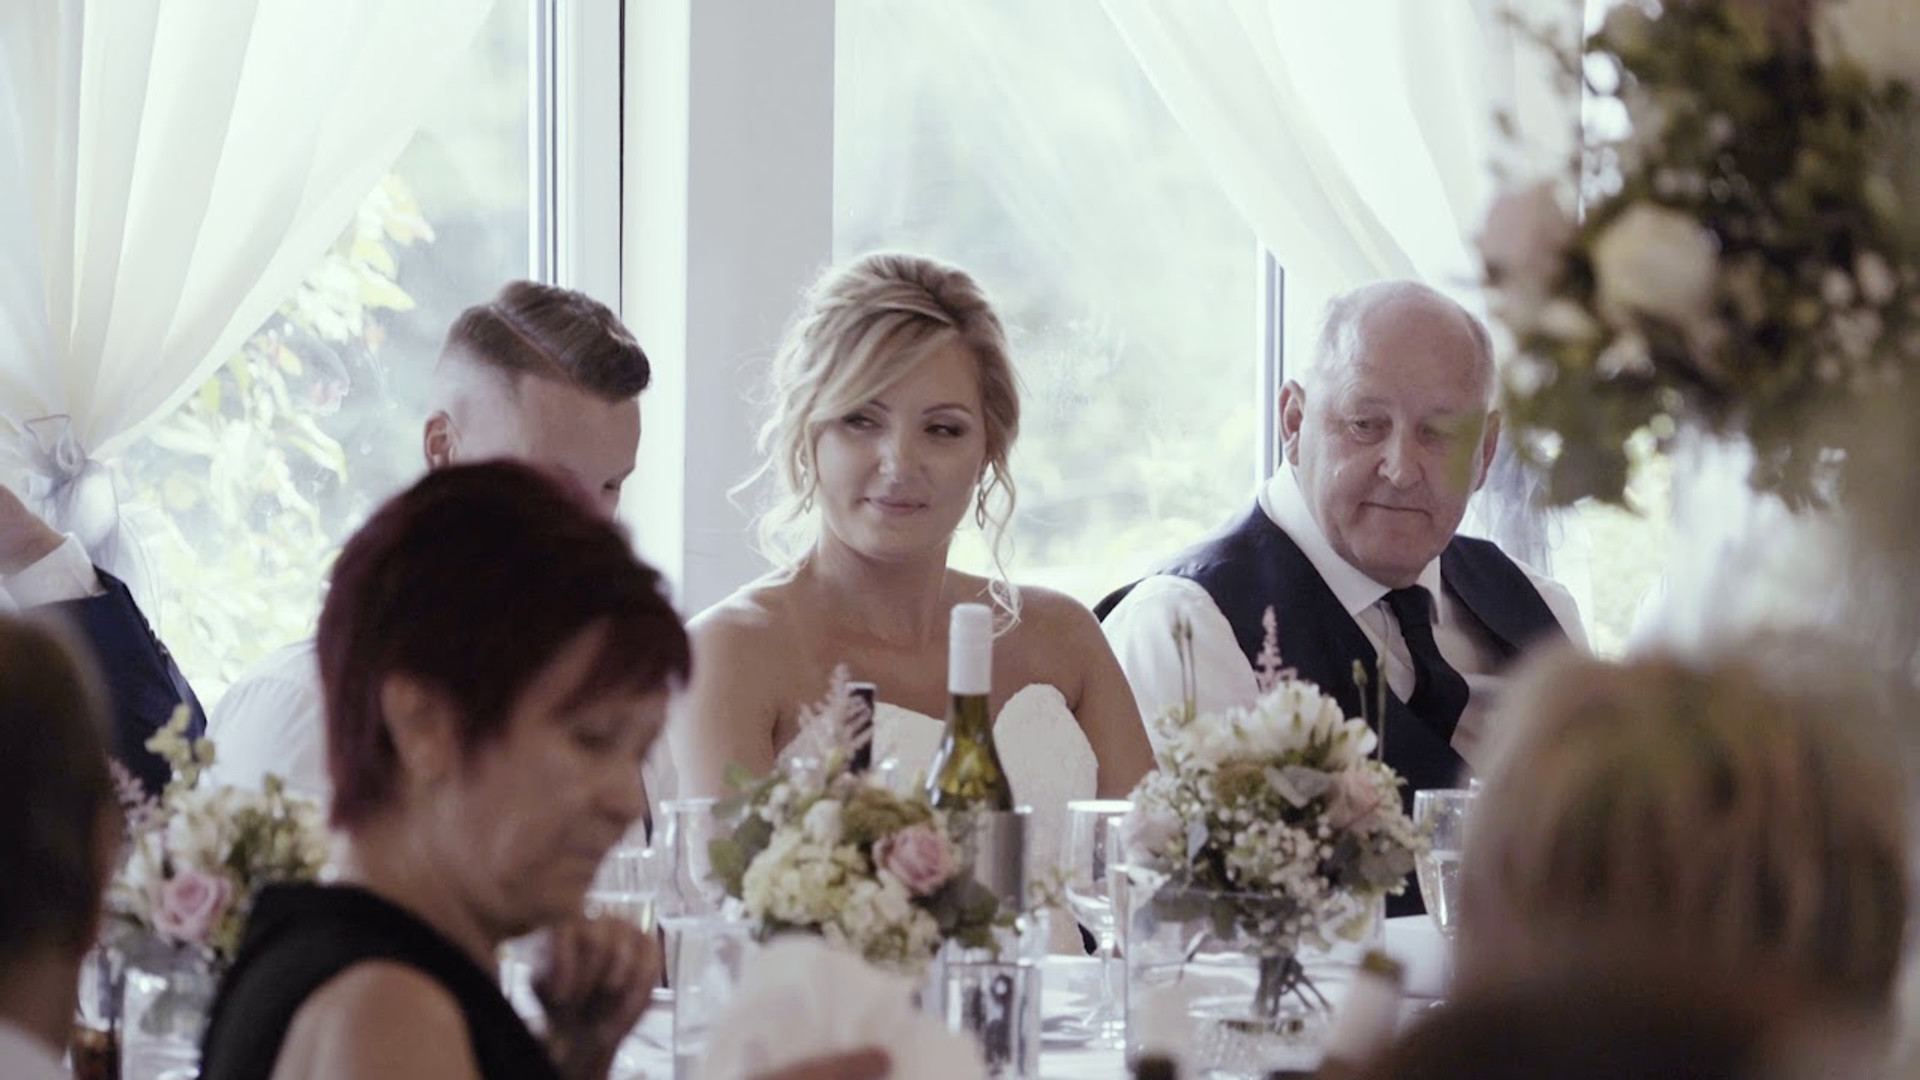 The Wedding of Kelly & Dan - Luke Baxter - Wedding & Events Videography - Brixton, London